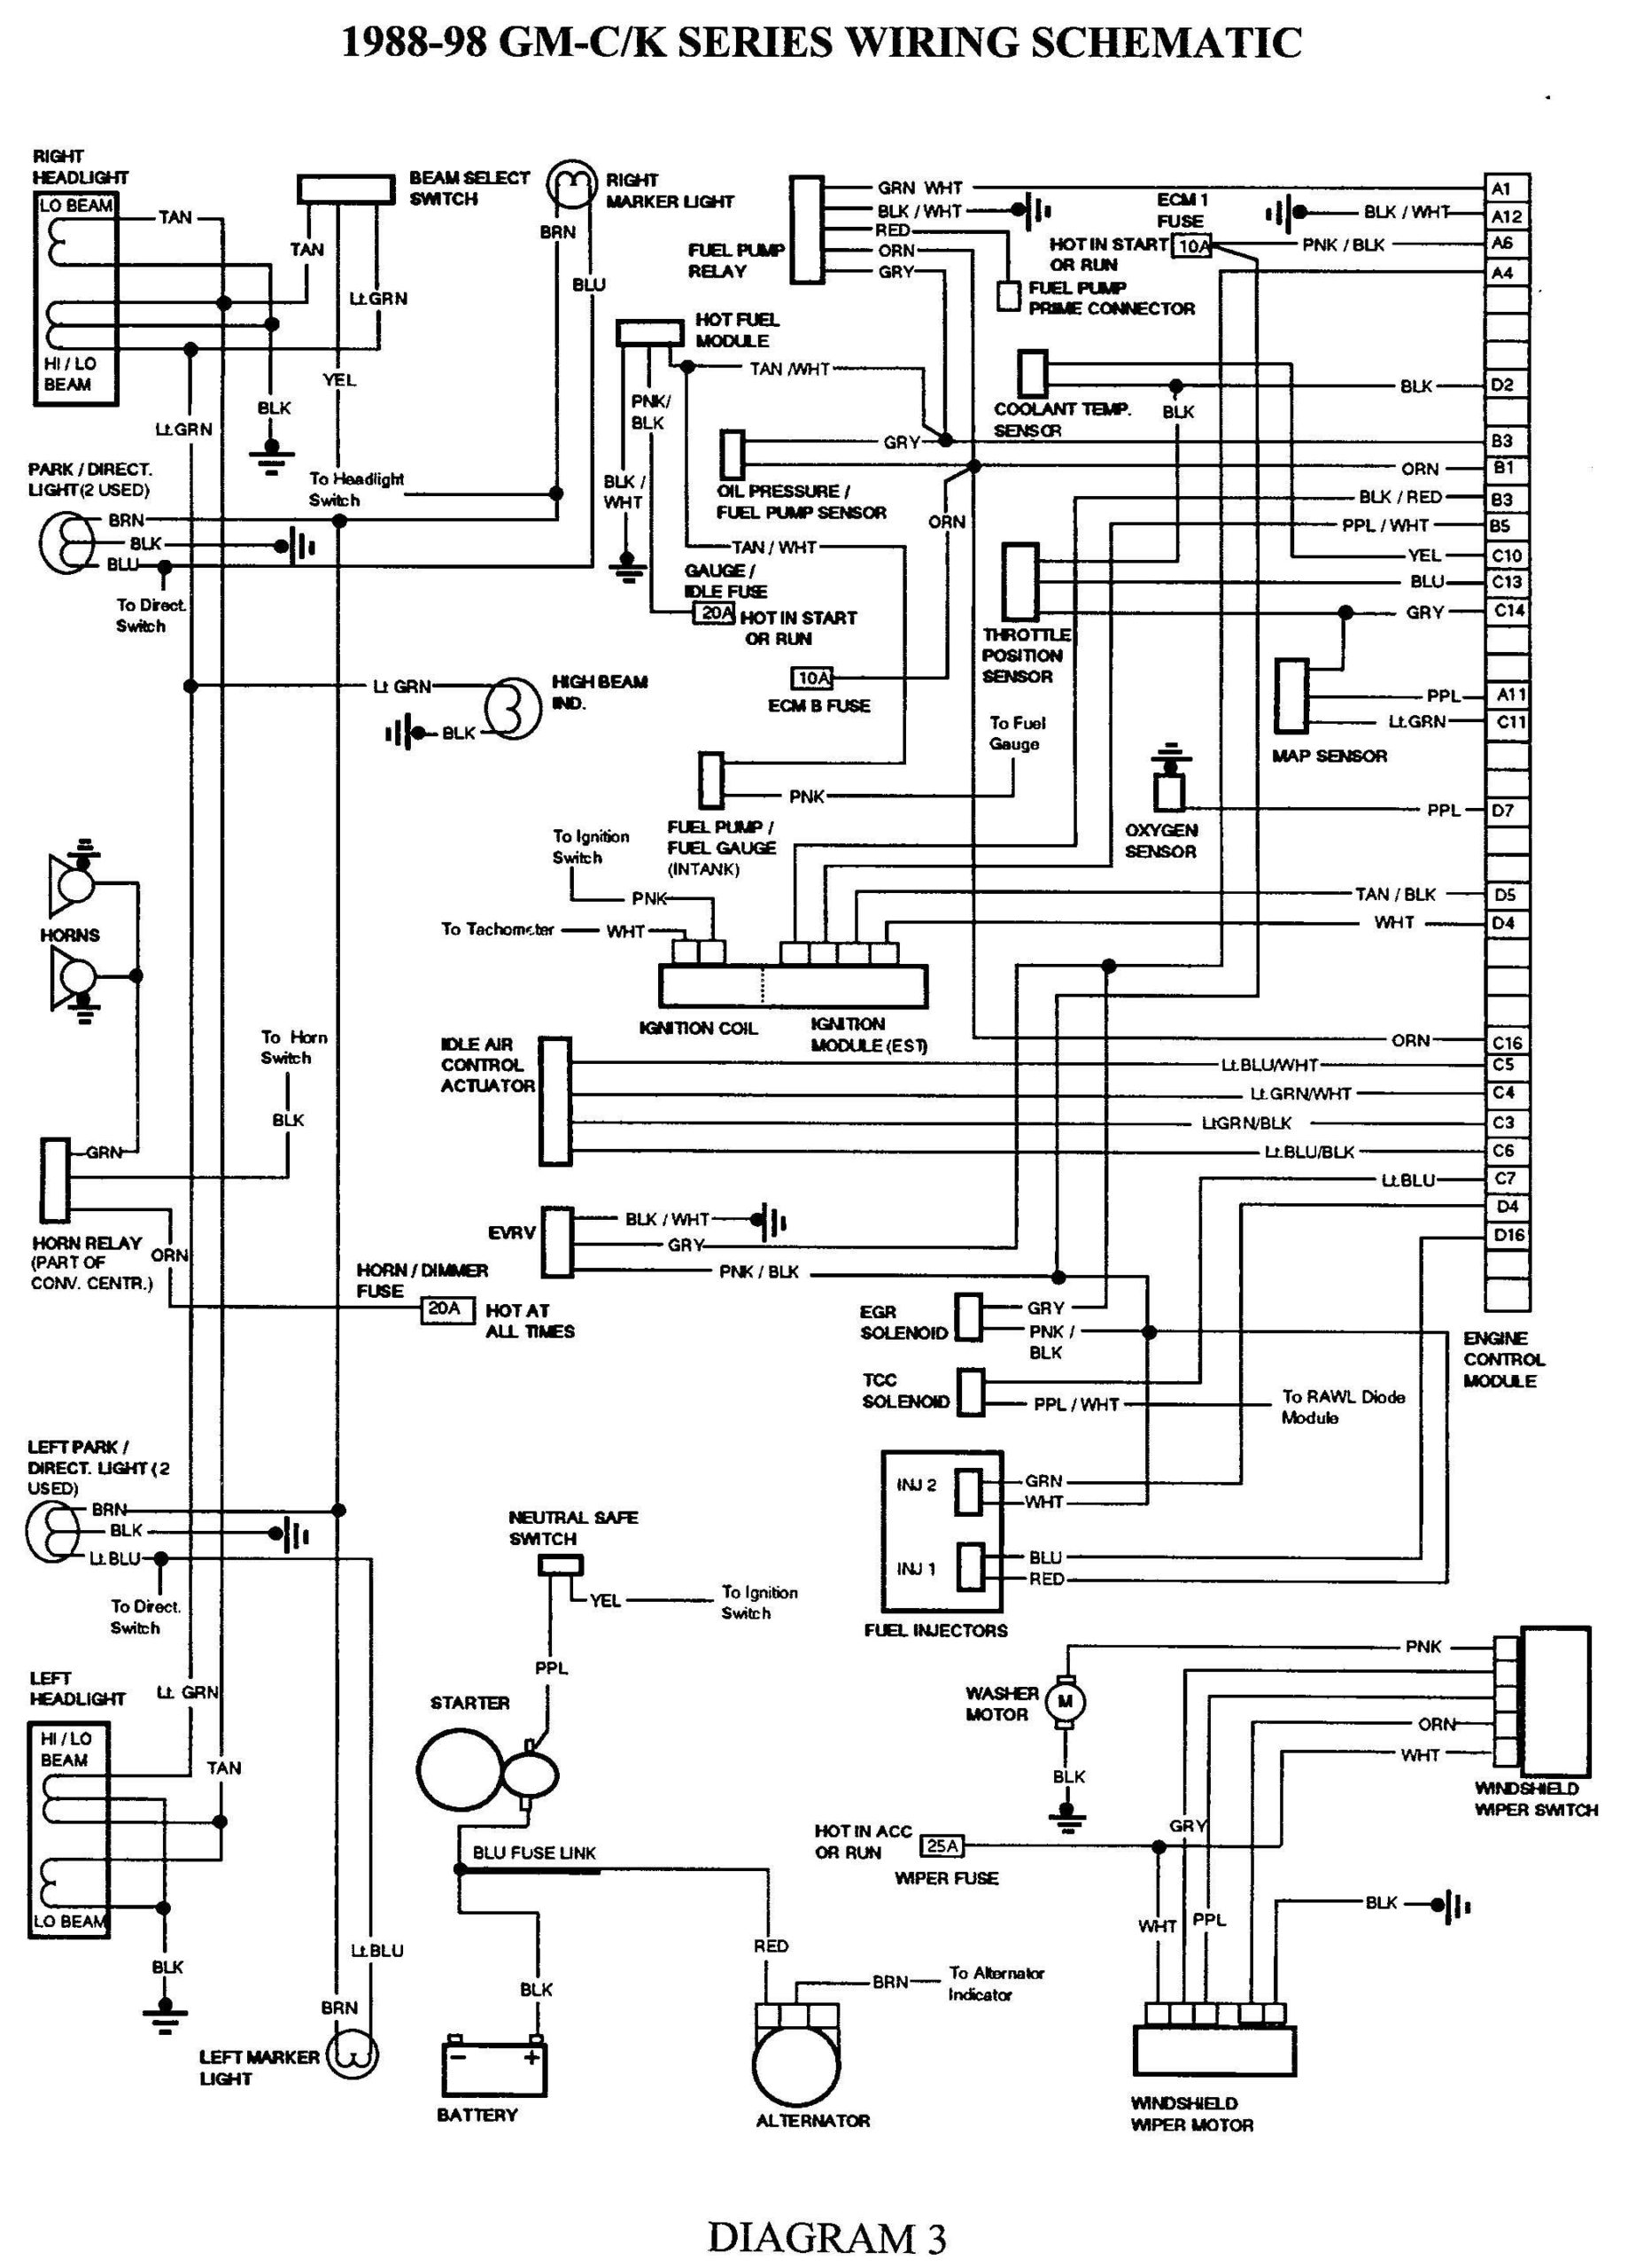 2005 Gmc Sierra Trailer Wiring Harness Diagram